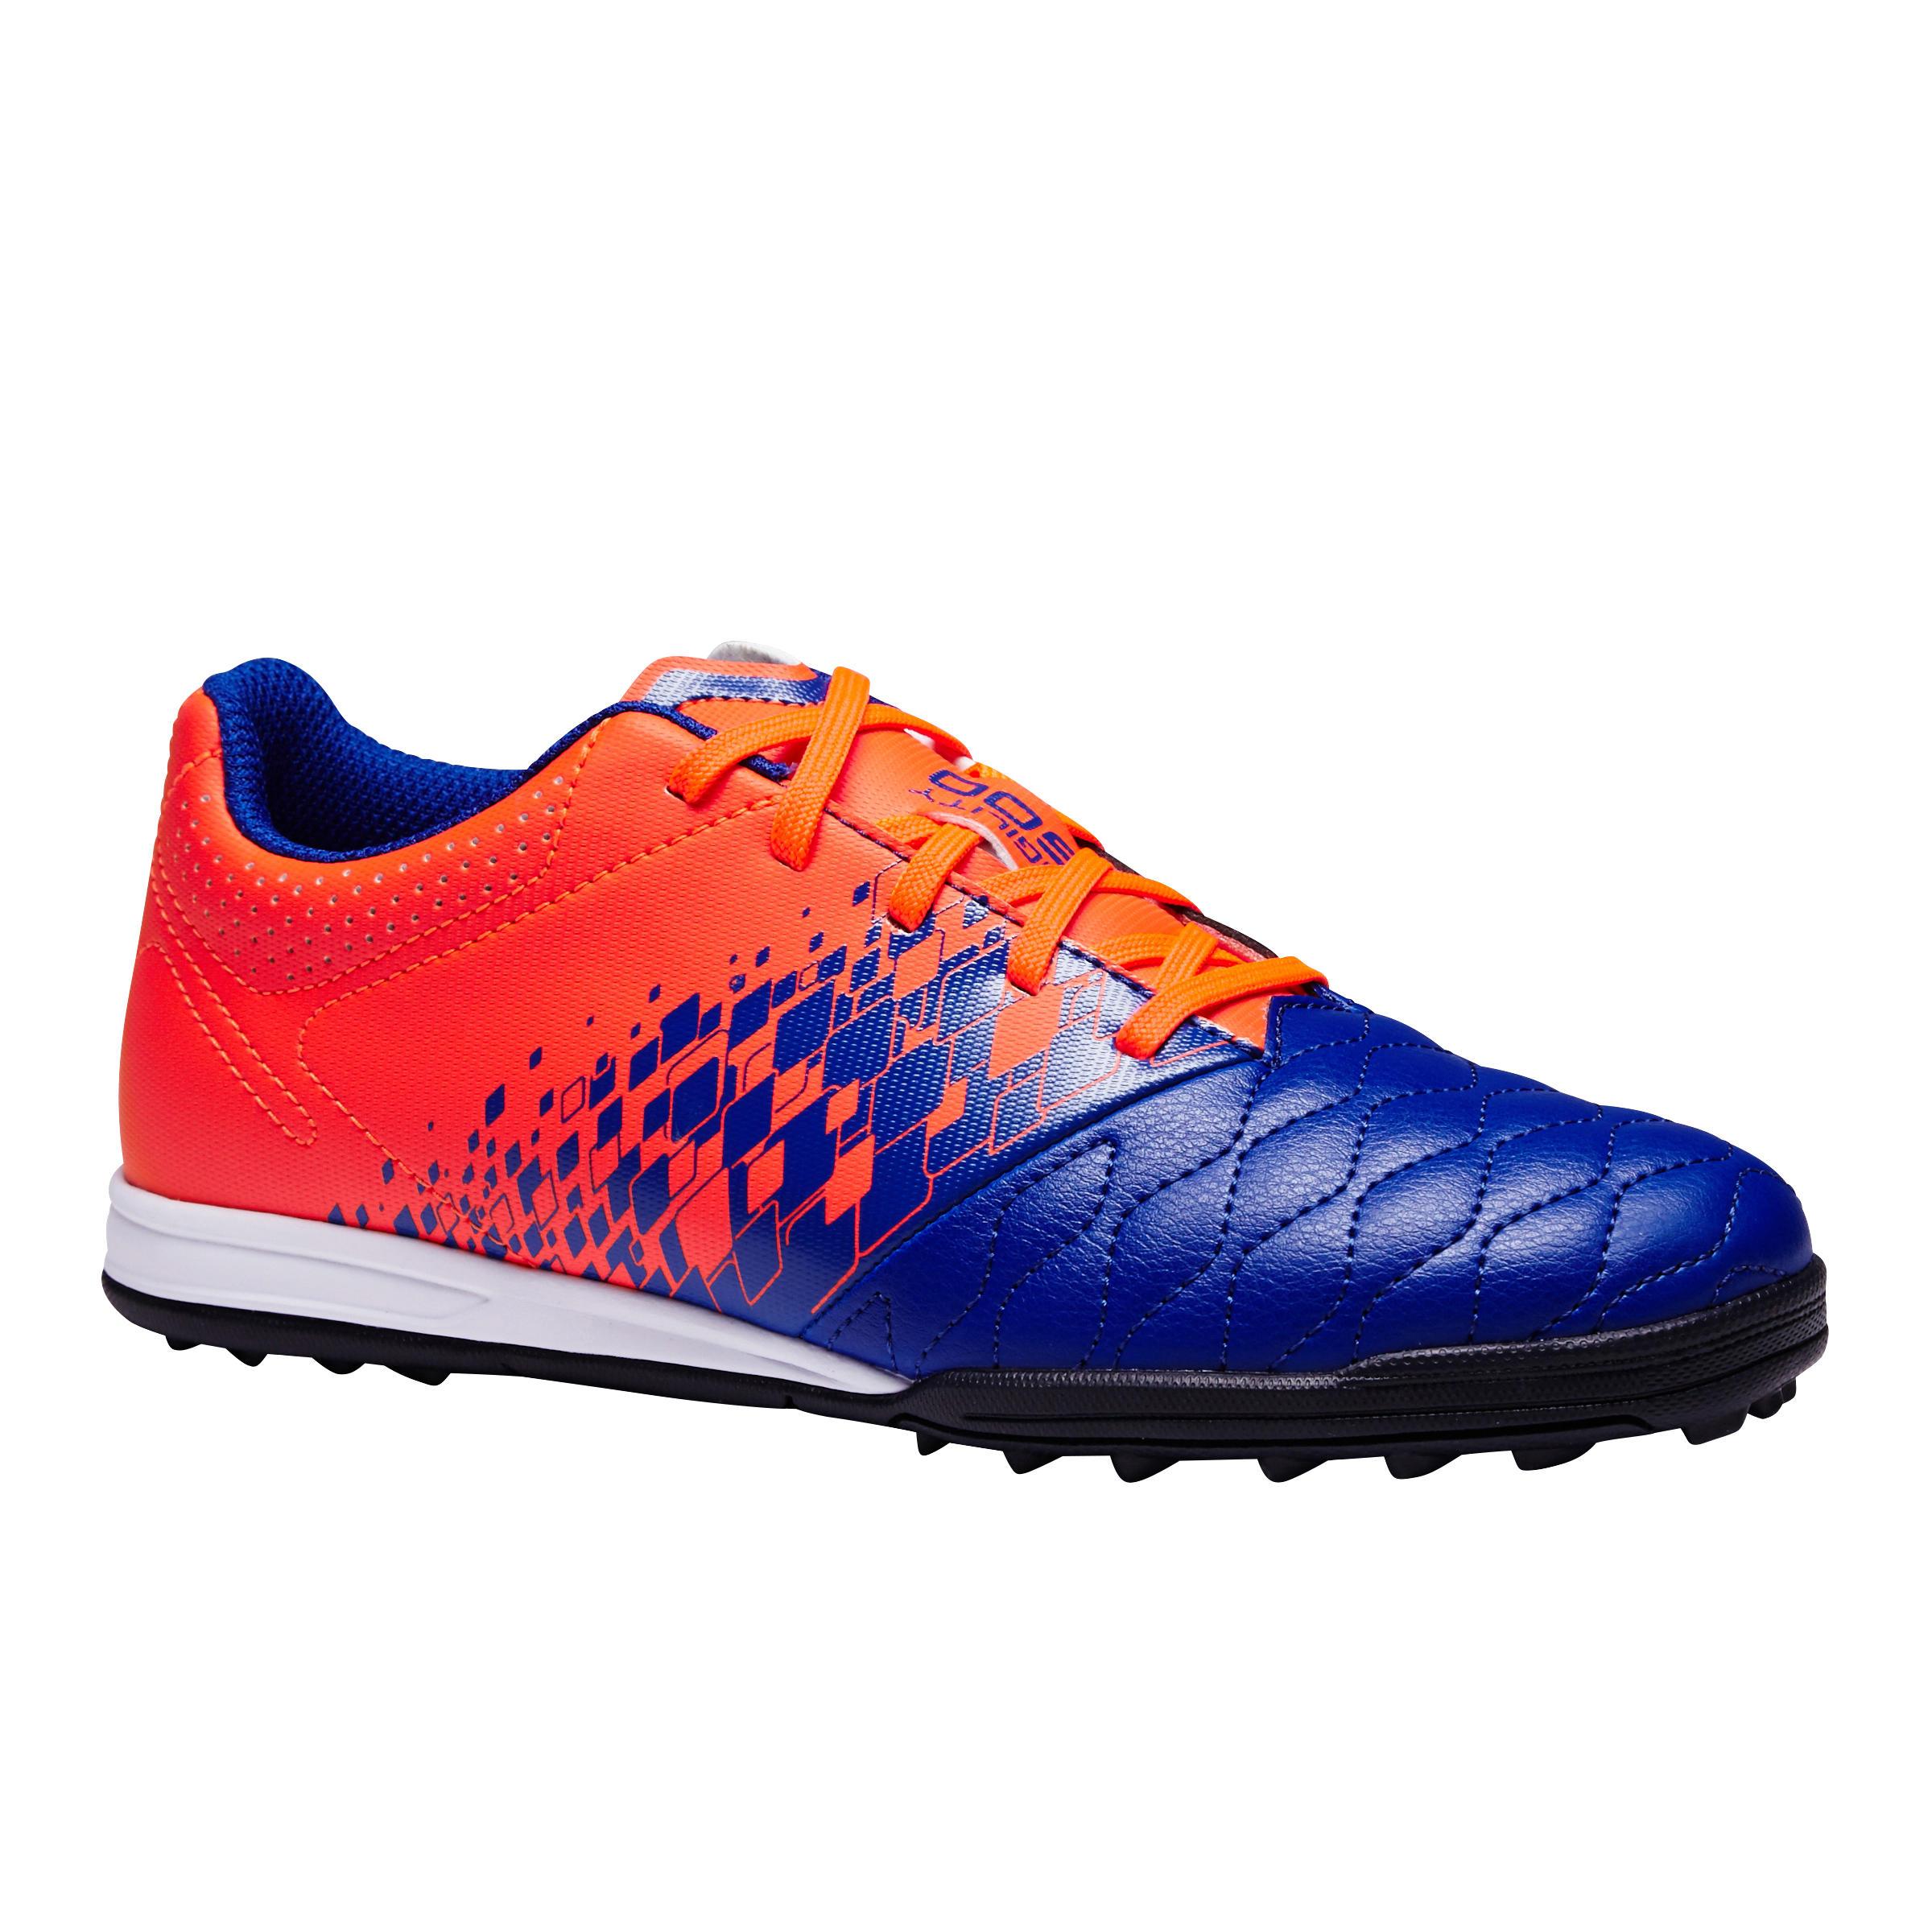 Agility 500 HG Kids Hard Pitch Soccer Shoes - Blue/Orange